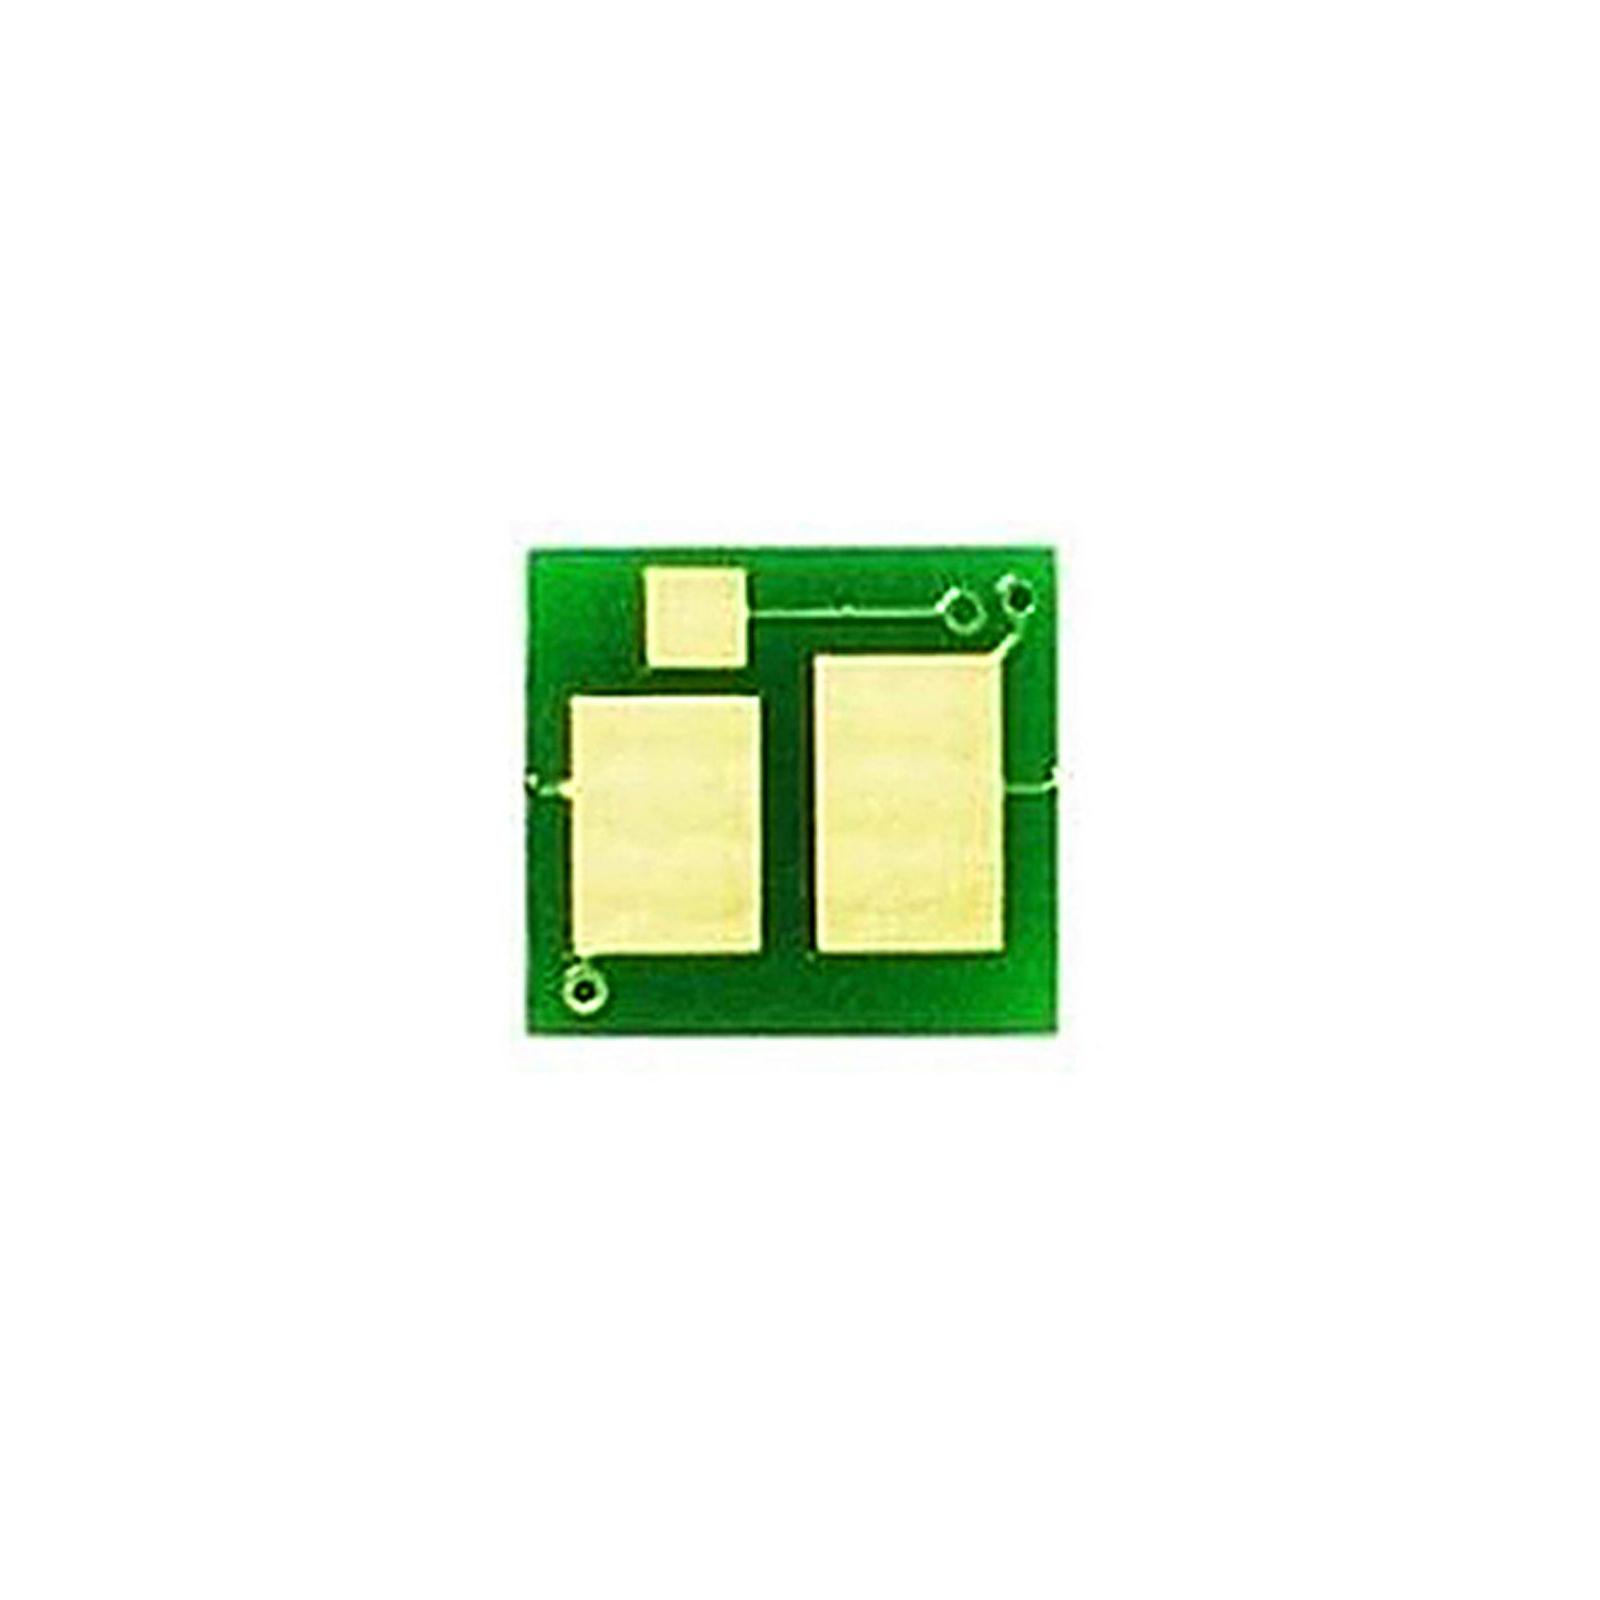 Чип для картриджа HP CLJ M254 1.3k cyan (CF541A) Static Control (HM254CP-CEU)